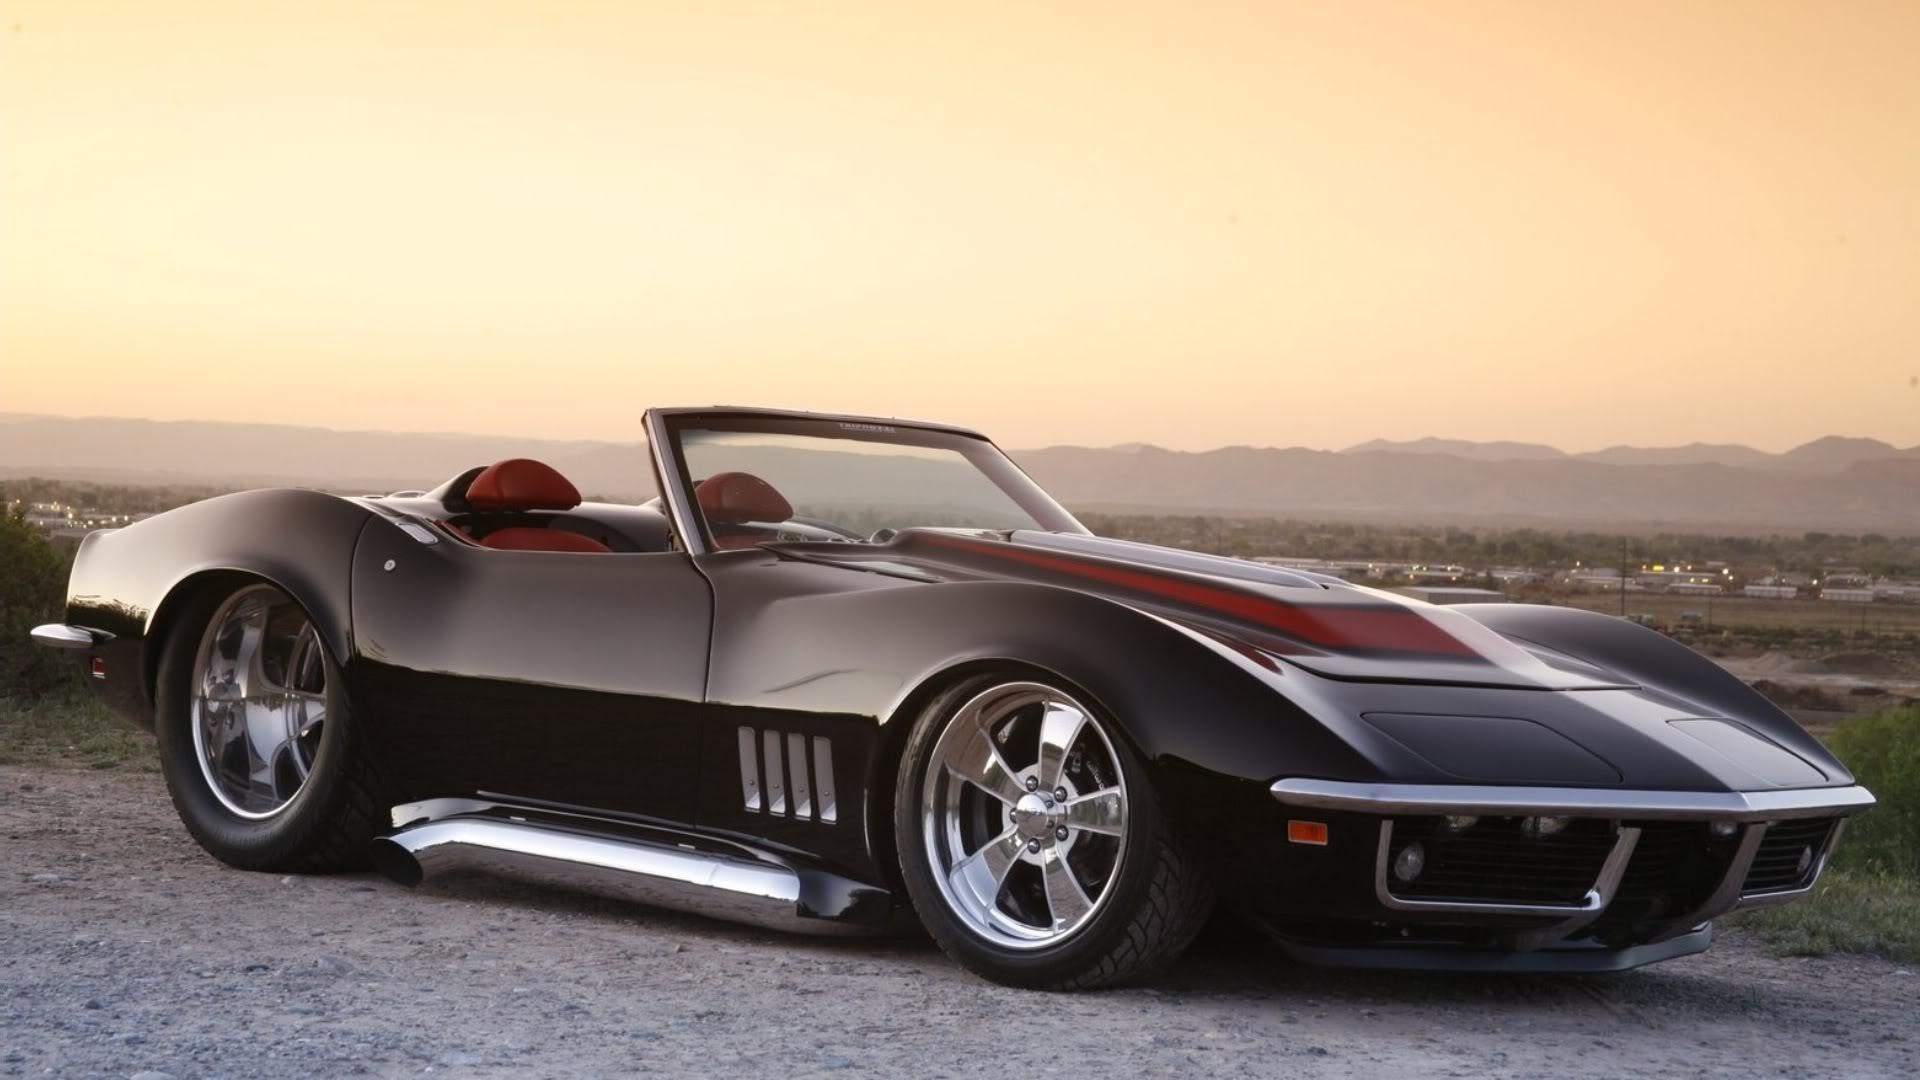 1969 black chevrolet corvette roadster wallpaper 1920x1080 36944. Cars Review. Best American Auto & Cars Review